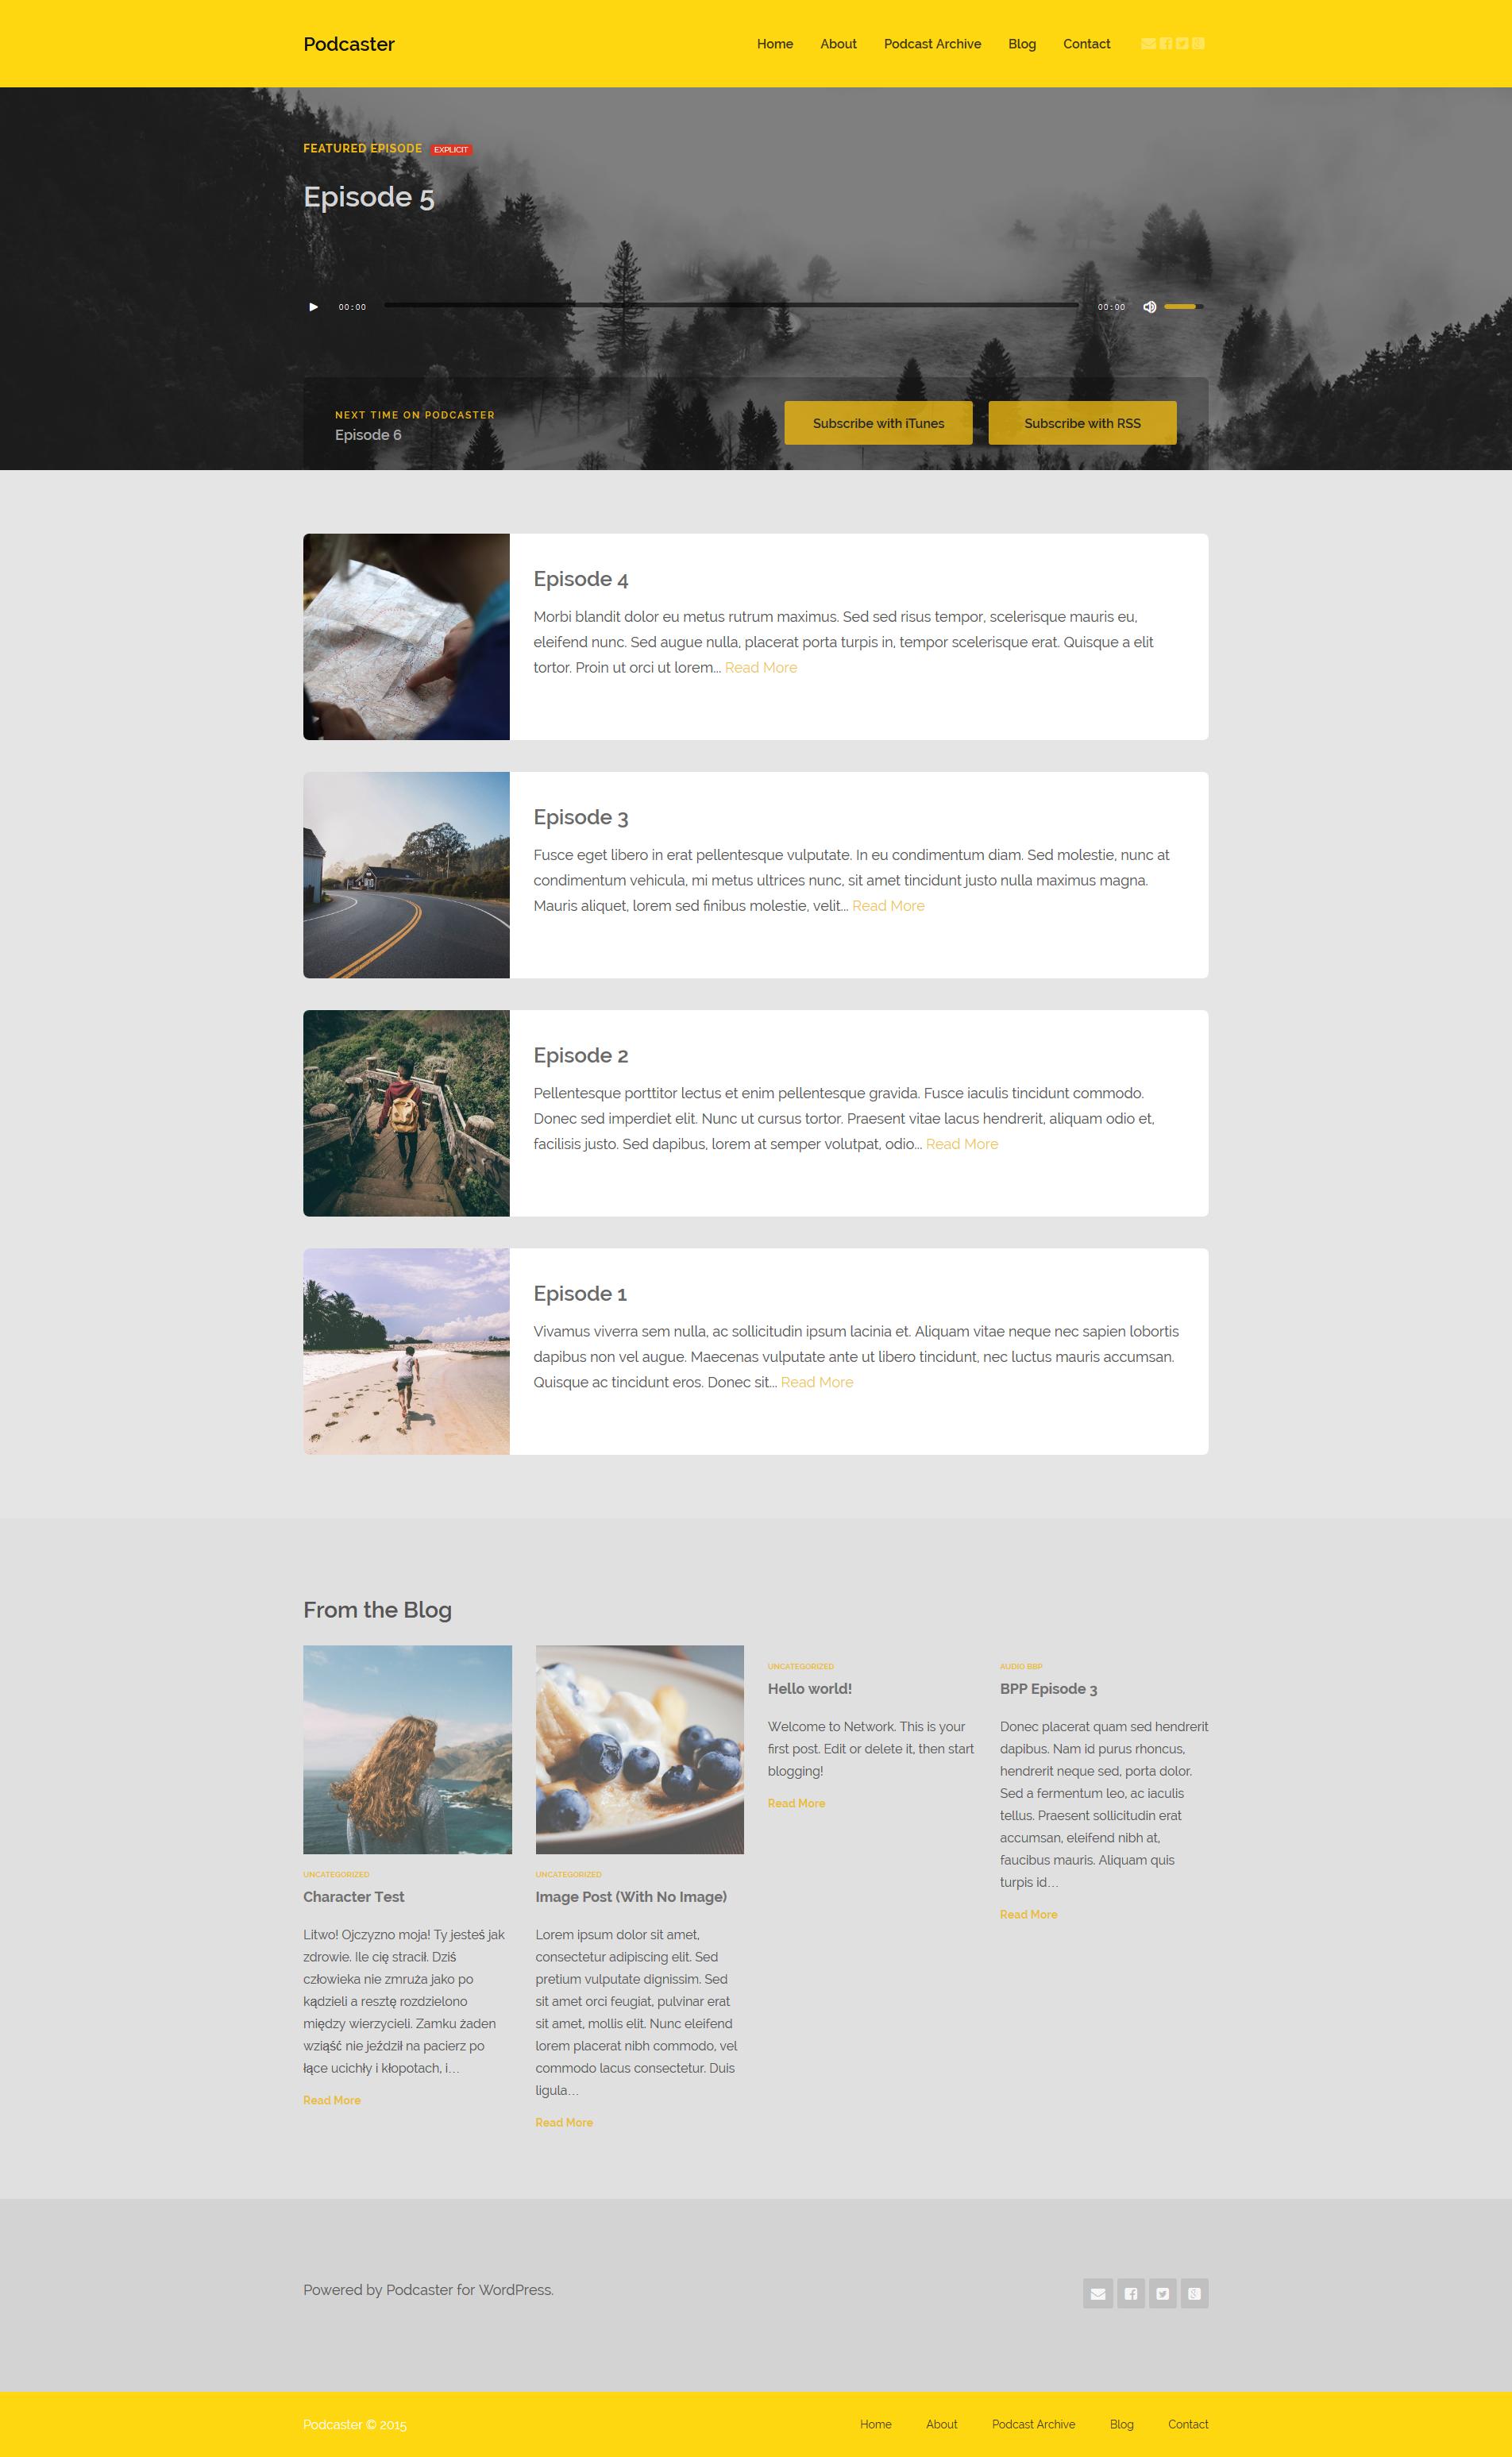 Großartig Bootstrap Themenvorlagen Ideen - Entry Level Resume ...